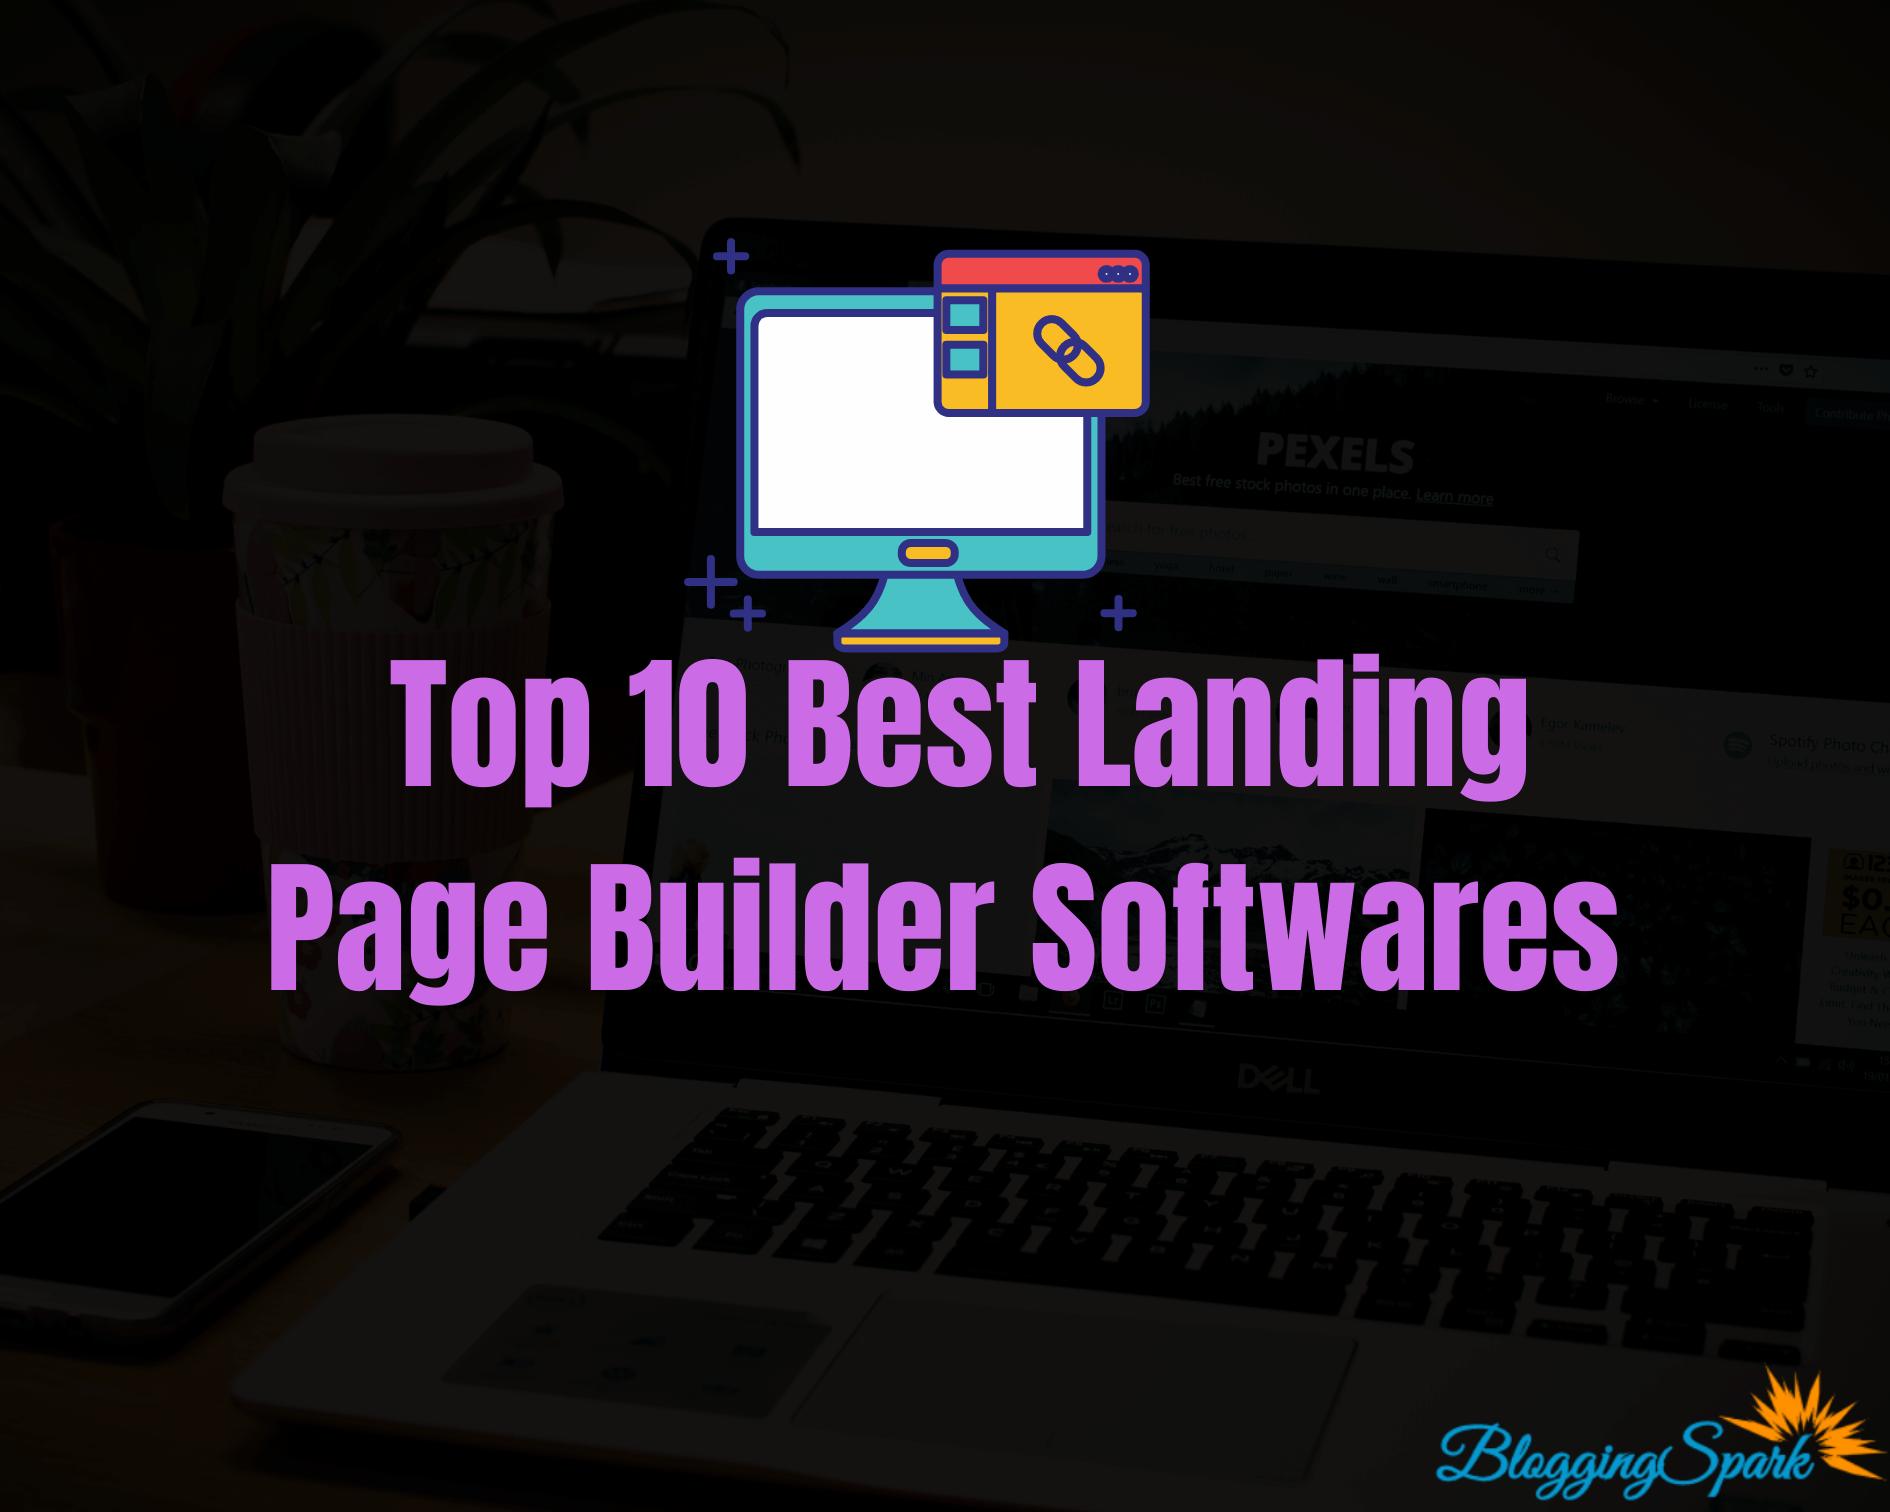 Top 10 Best Landing Page Builder Softwares in 2020